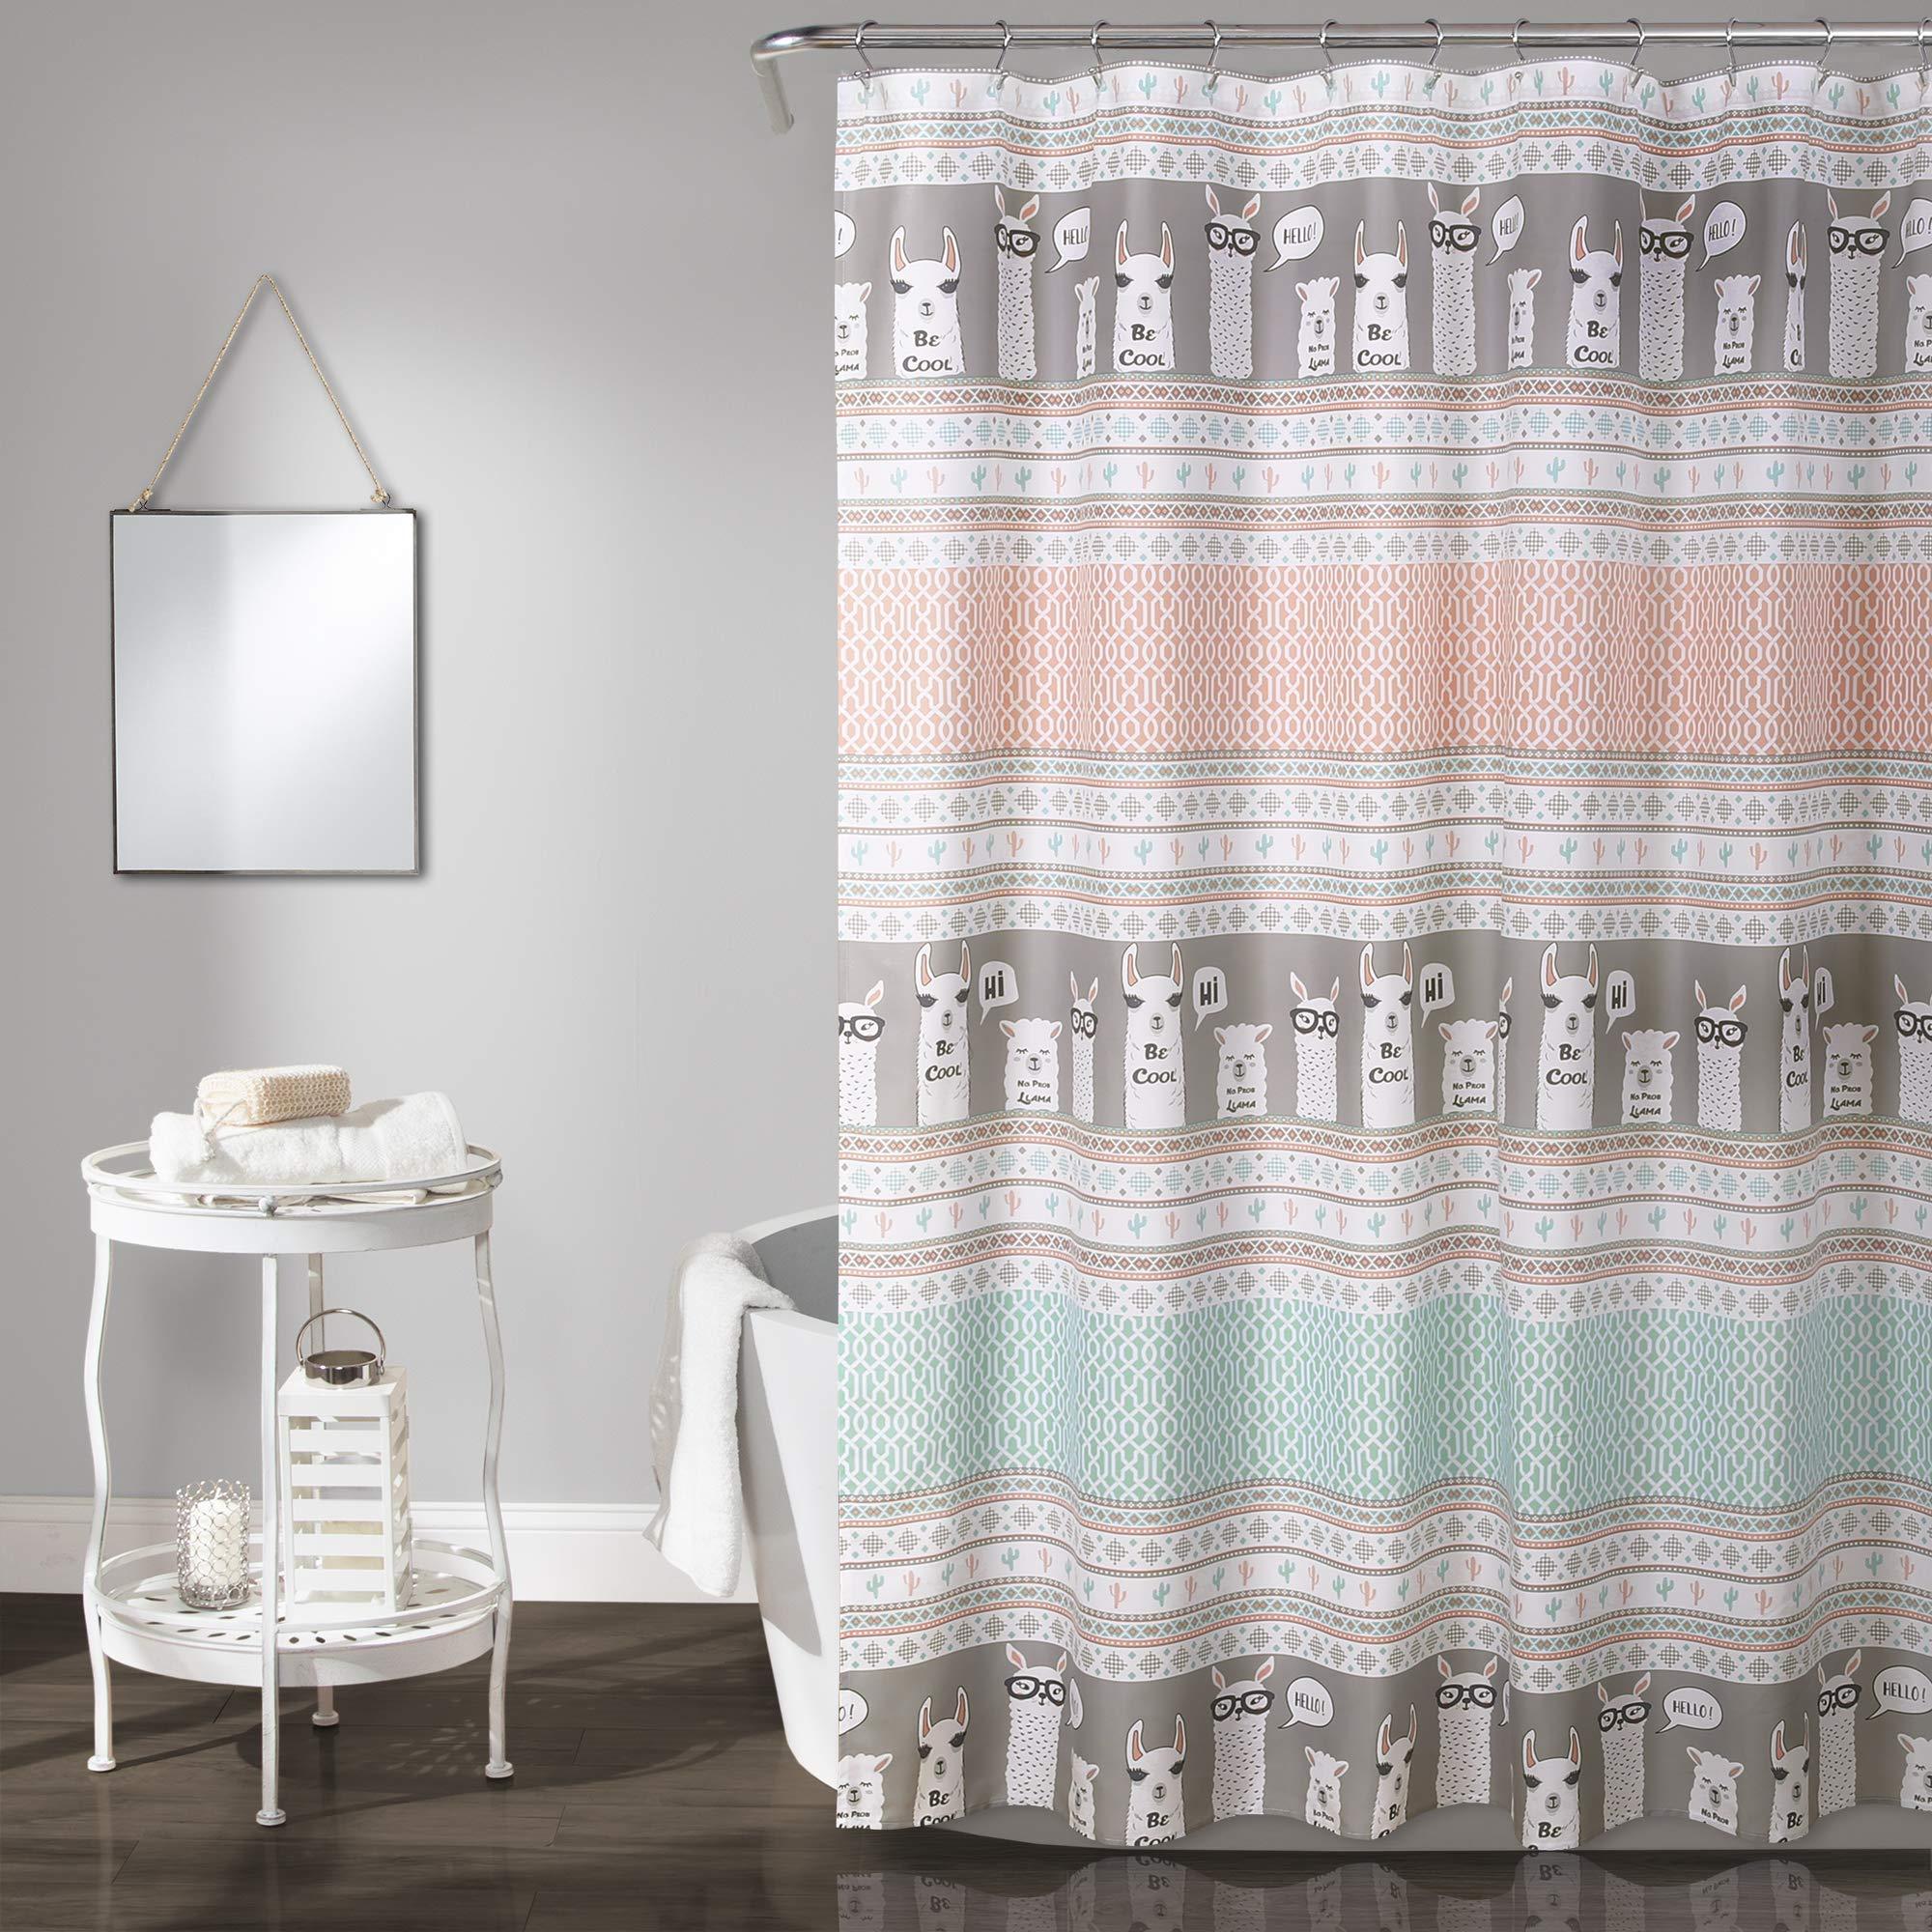 Lush Decor Llama Stripe Shower Curtain, 72'' x 72'', Pink and Turquoise